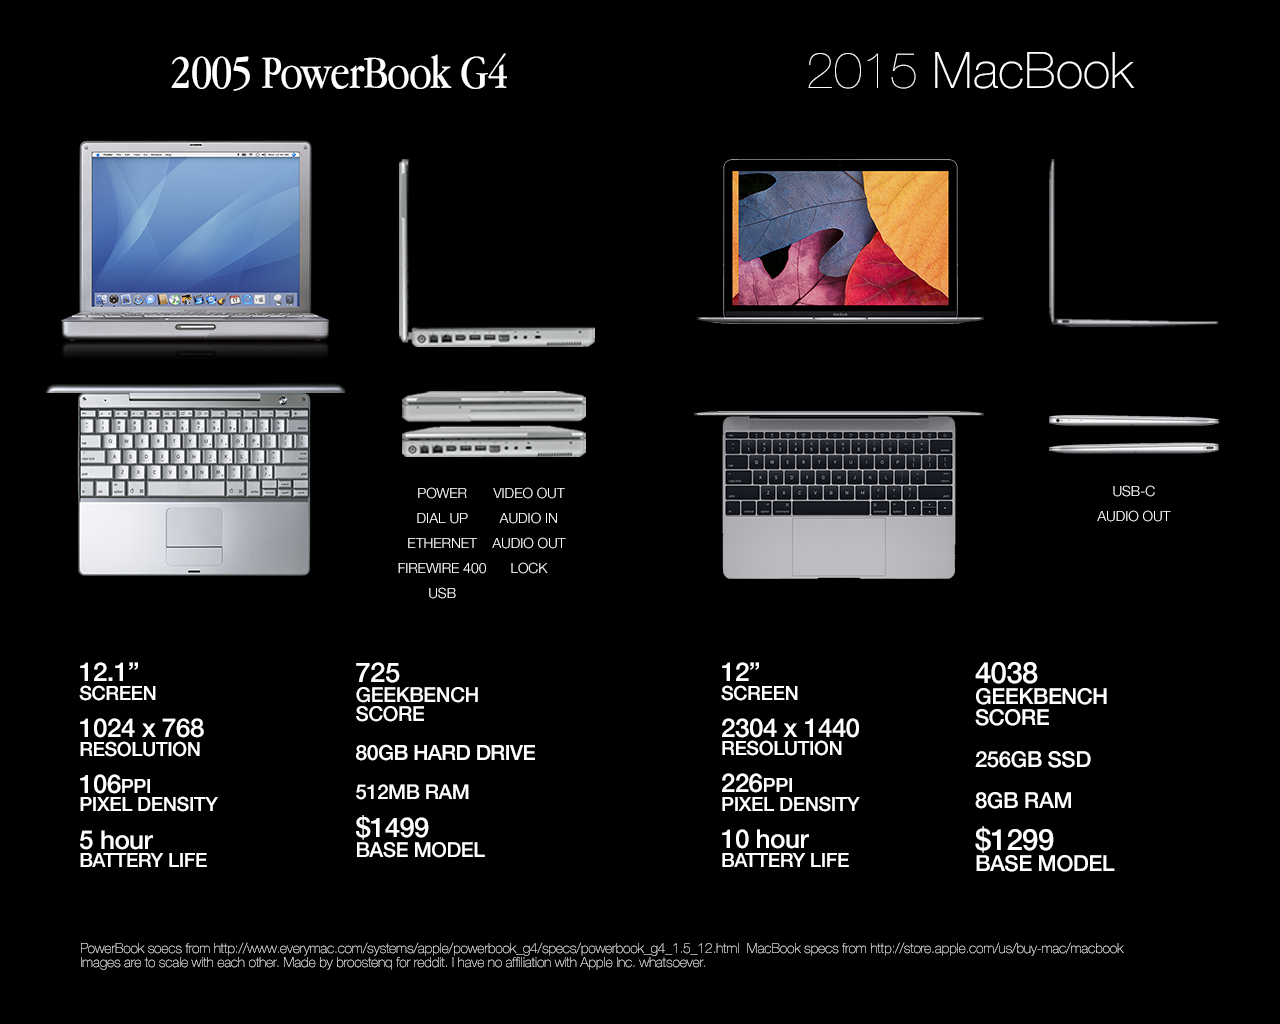 12-inch Retina MacBook vs. 12-inch Powerbook